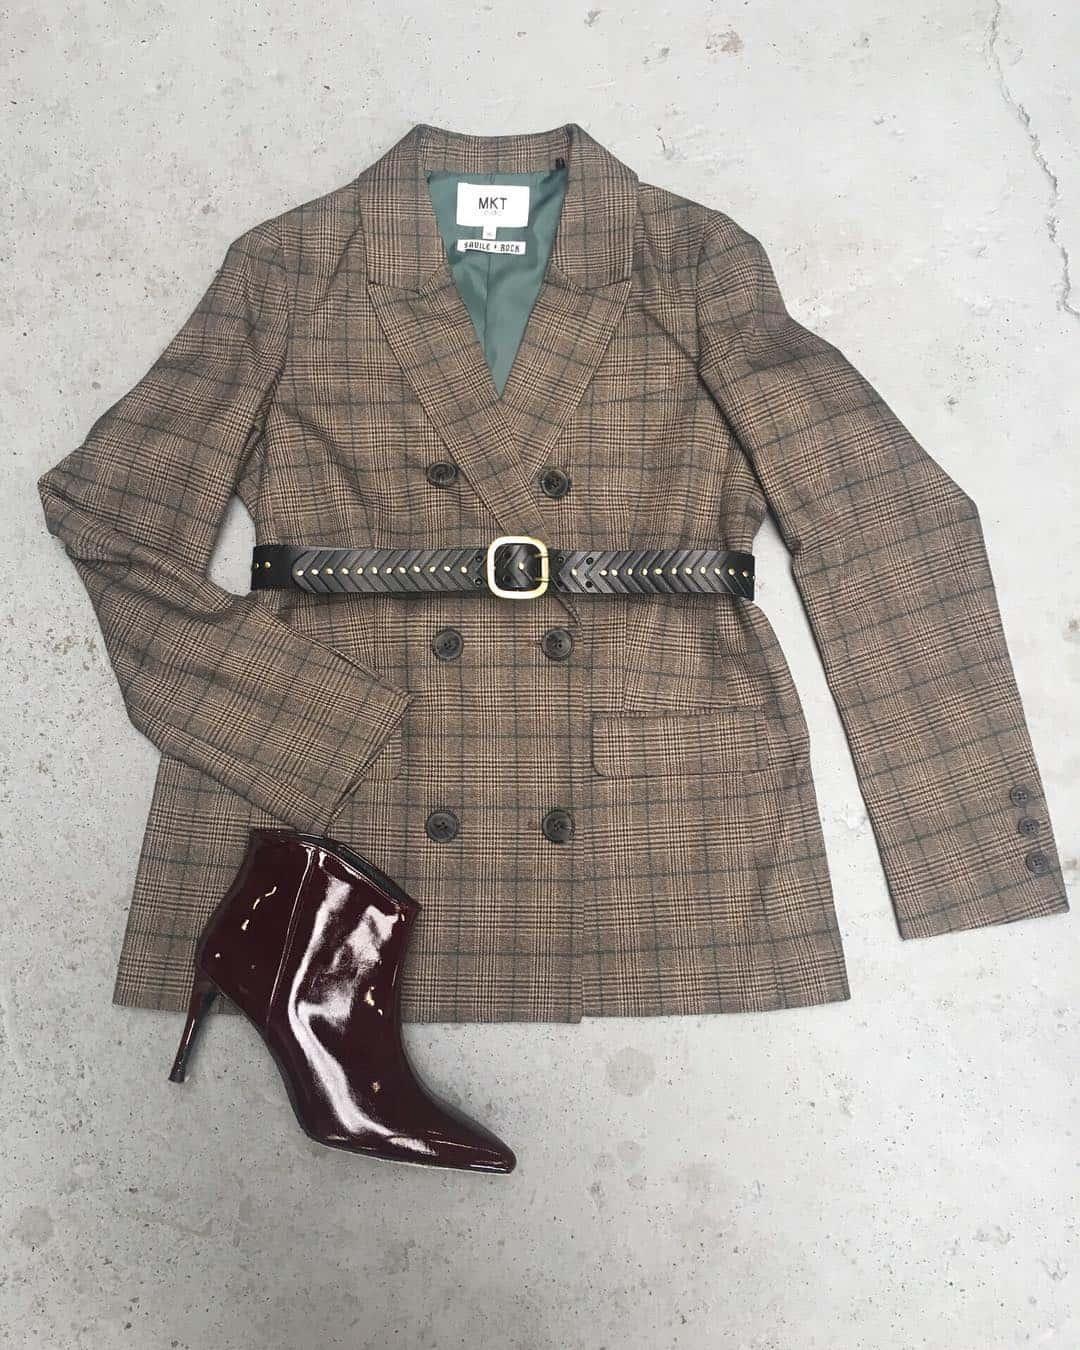 womens-blazers-2021-checkered-blazers-for-women-2021